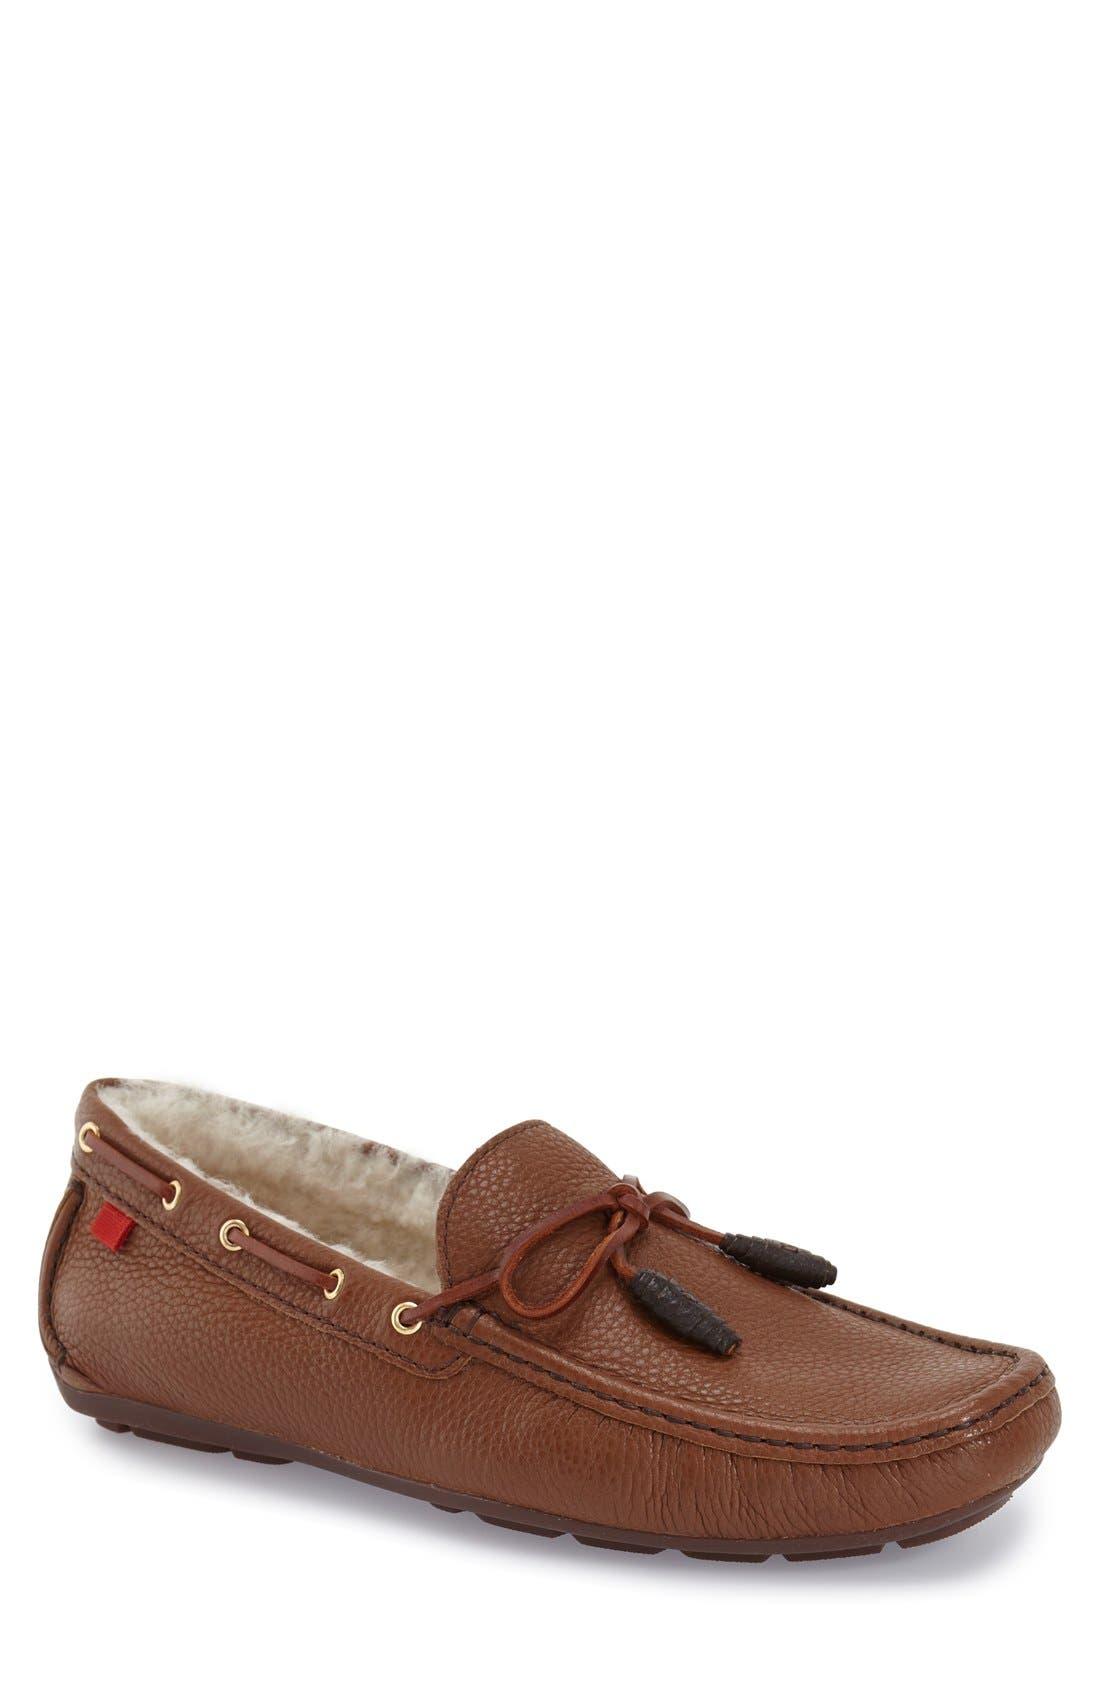 MARC JOSEPH NEW YORK Rockefeller Genuine Shearling Lined Driving Shoe